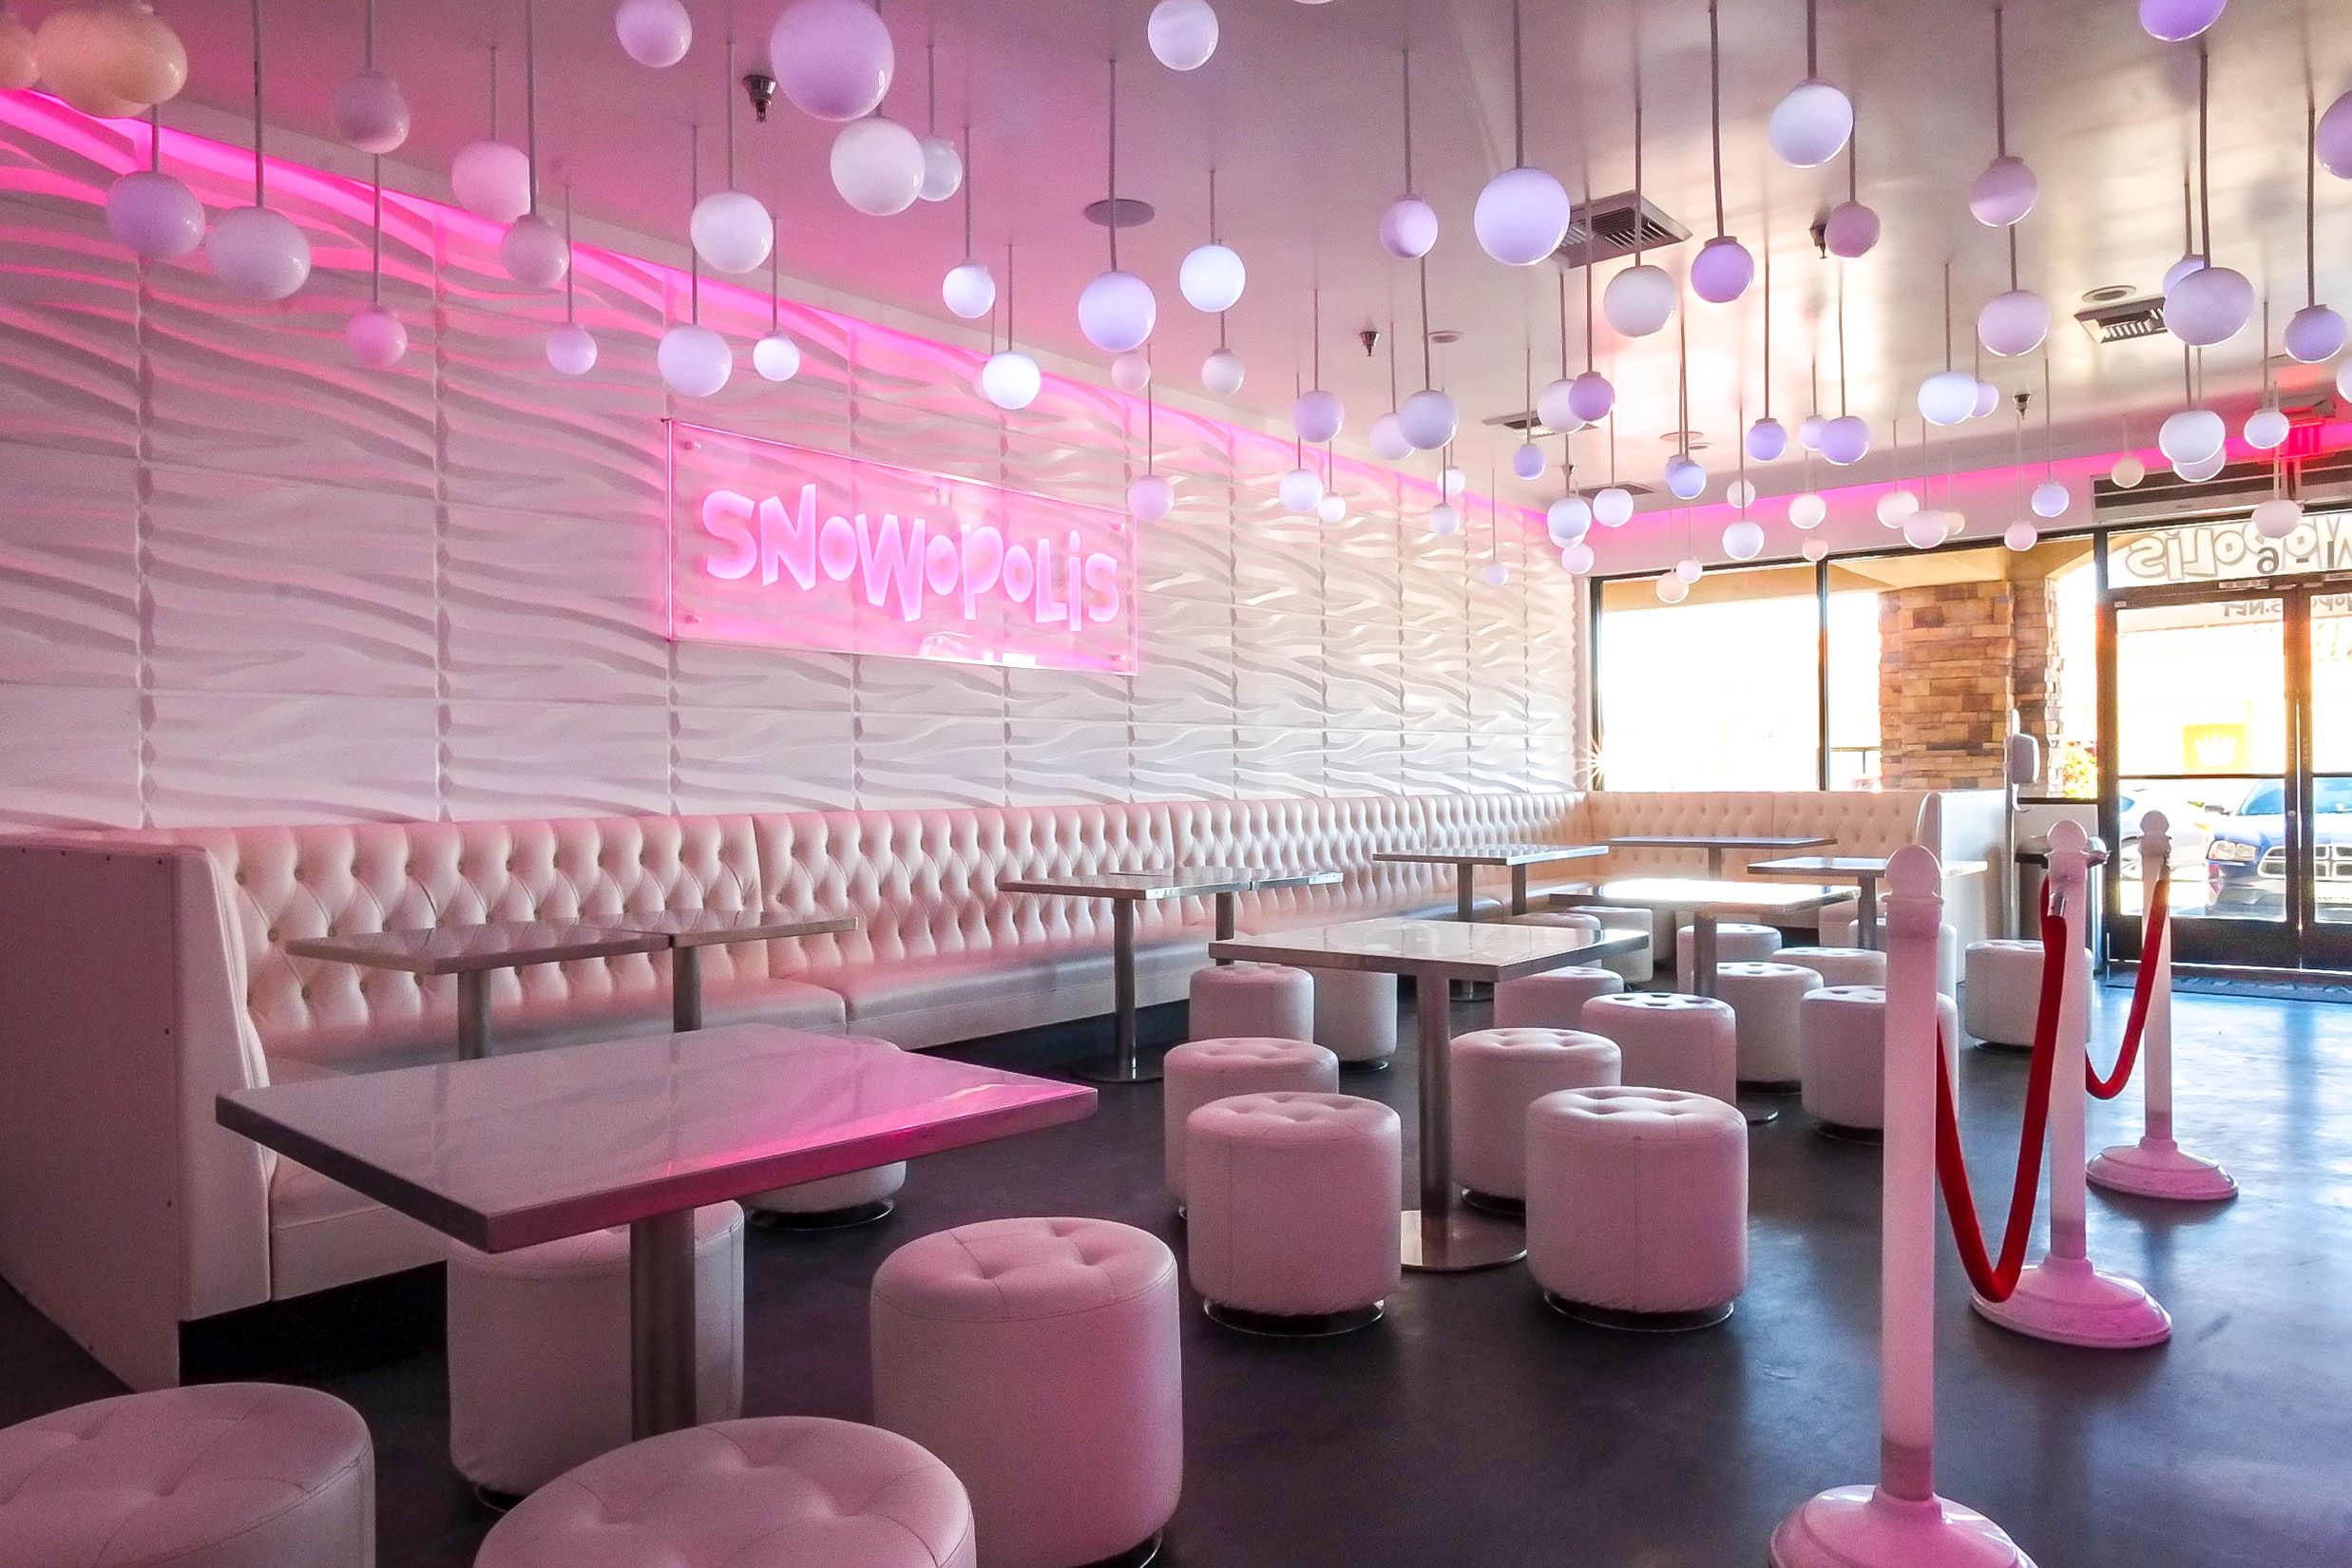 Snowopolis julie khuu interior design website and life - Interior design shopping websites ...